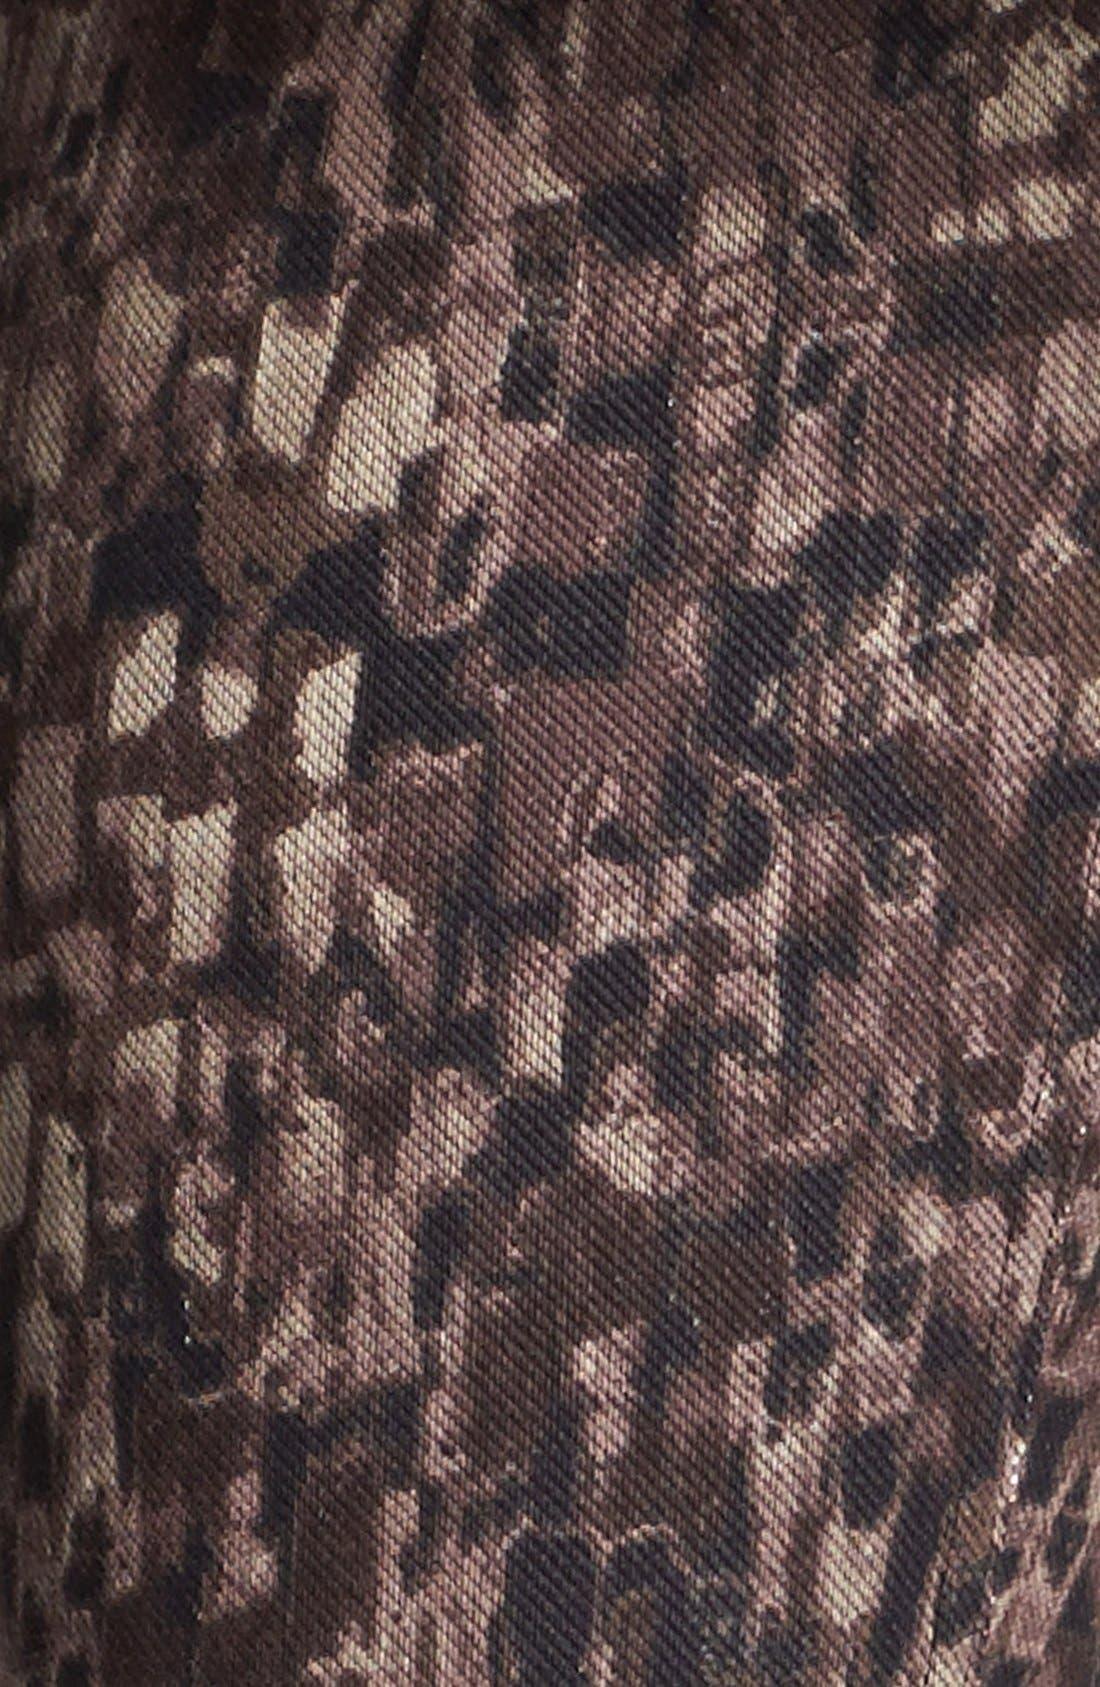 Alternate Image 2  - Hue 'Abstract Geo' Print Denim Leggings (Online Only)